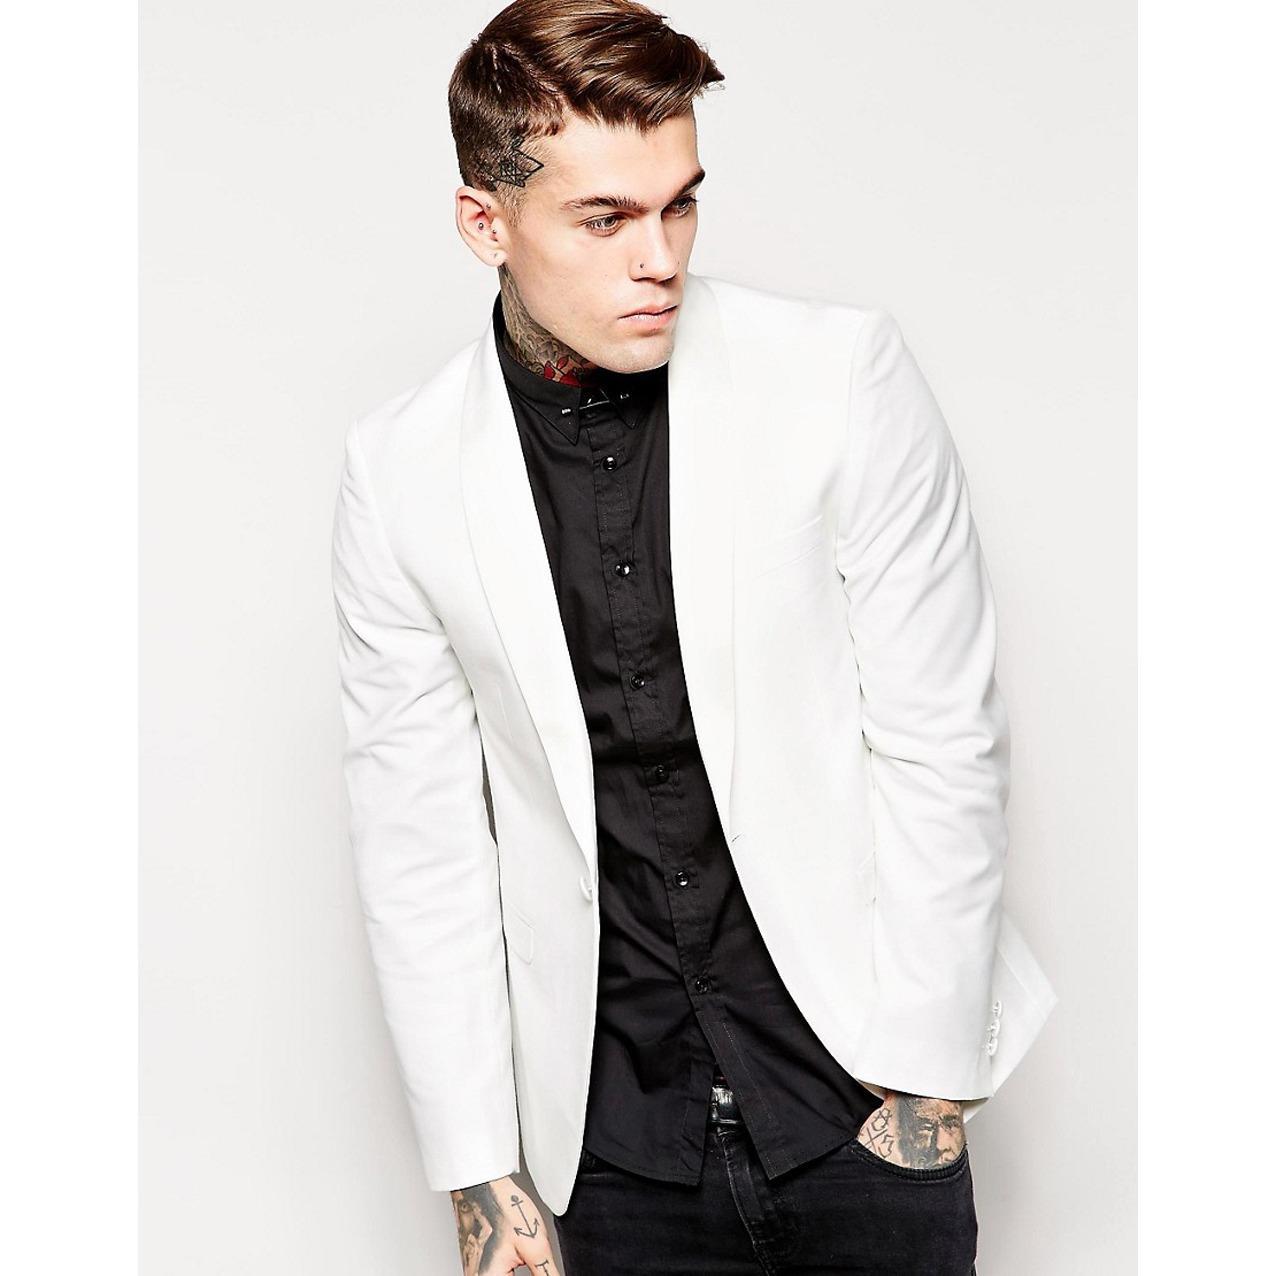 Jhonny Osvaldo - Jas Semiformal Jatted Pocket Single Button Suit - Jas Multimoment - Jas Casual - Jas Kerja - Jas Party - Jas Prewedding - White